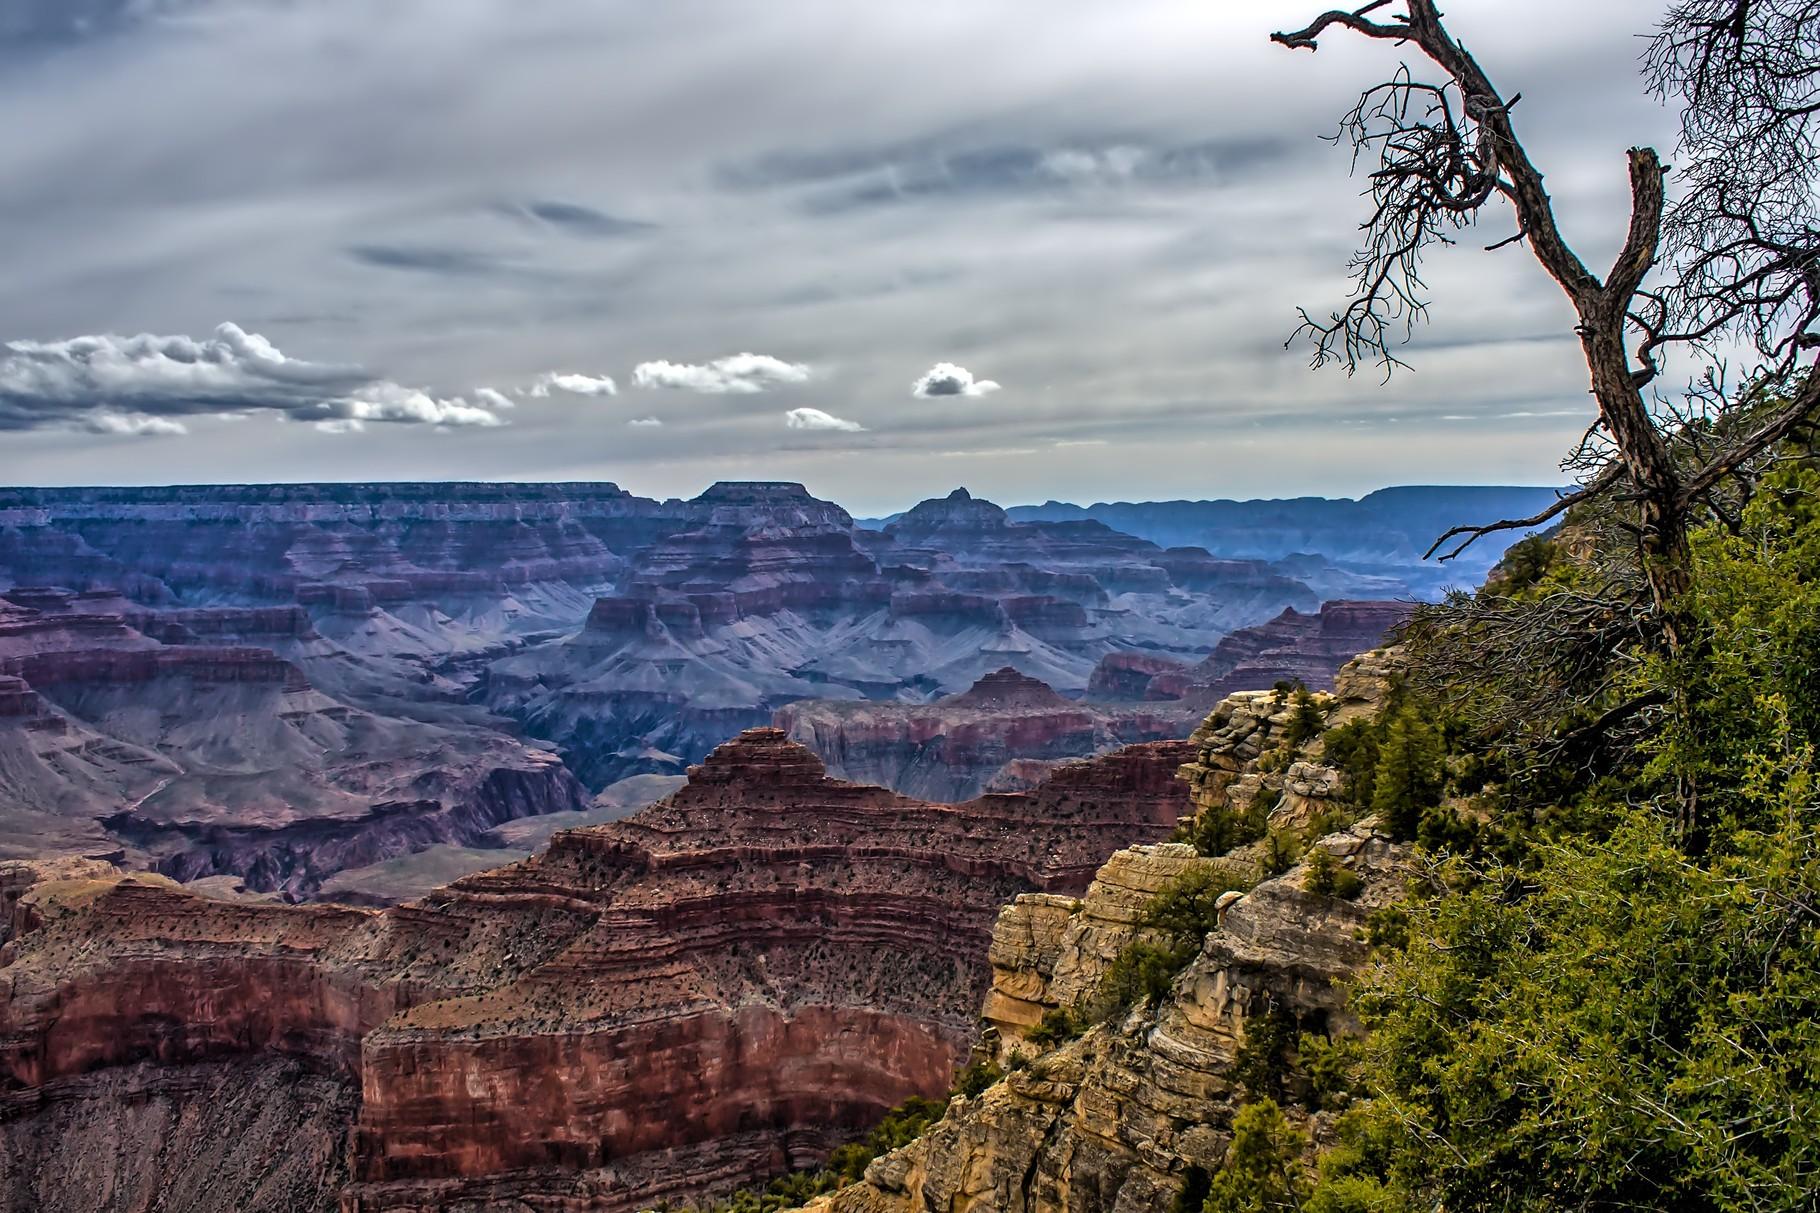 26_Grand Canyon (South Rim) in Arizona